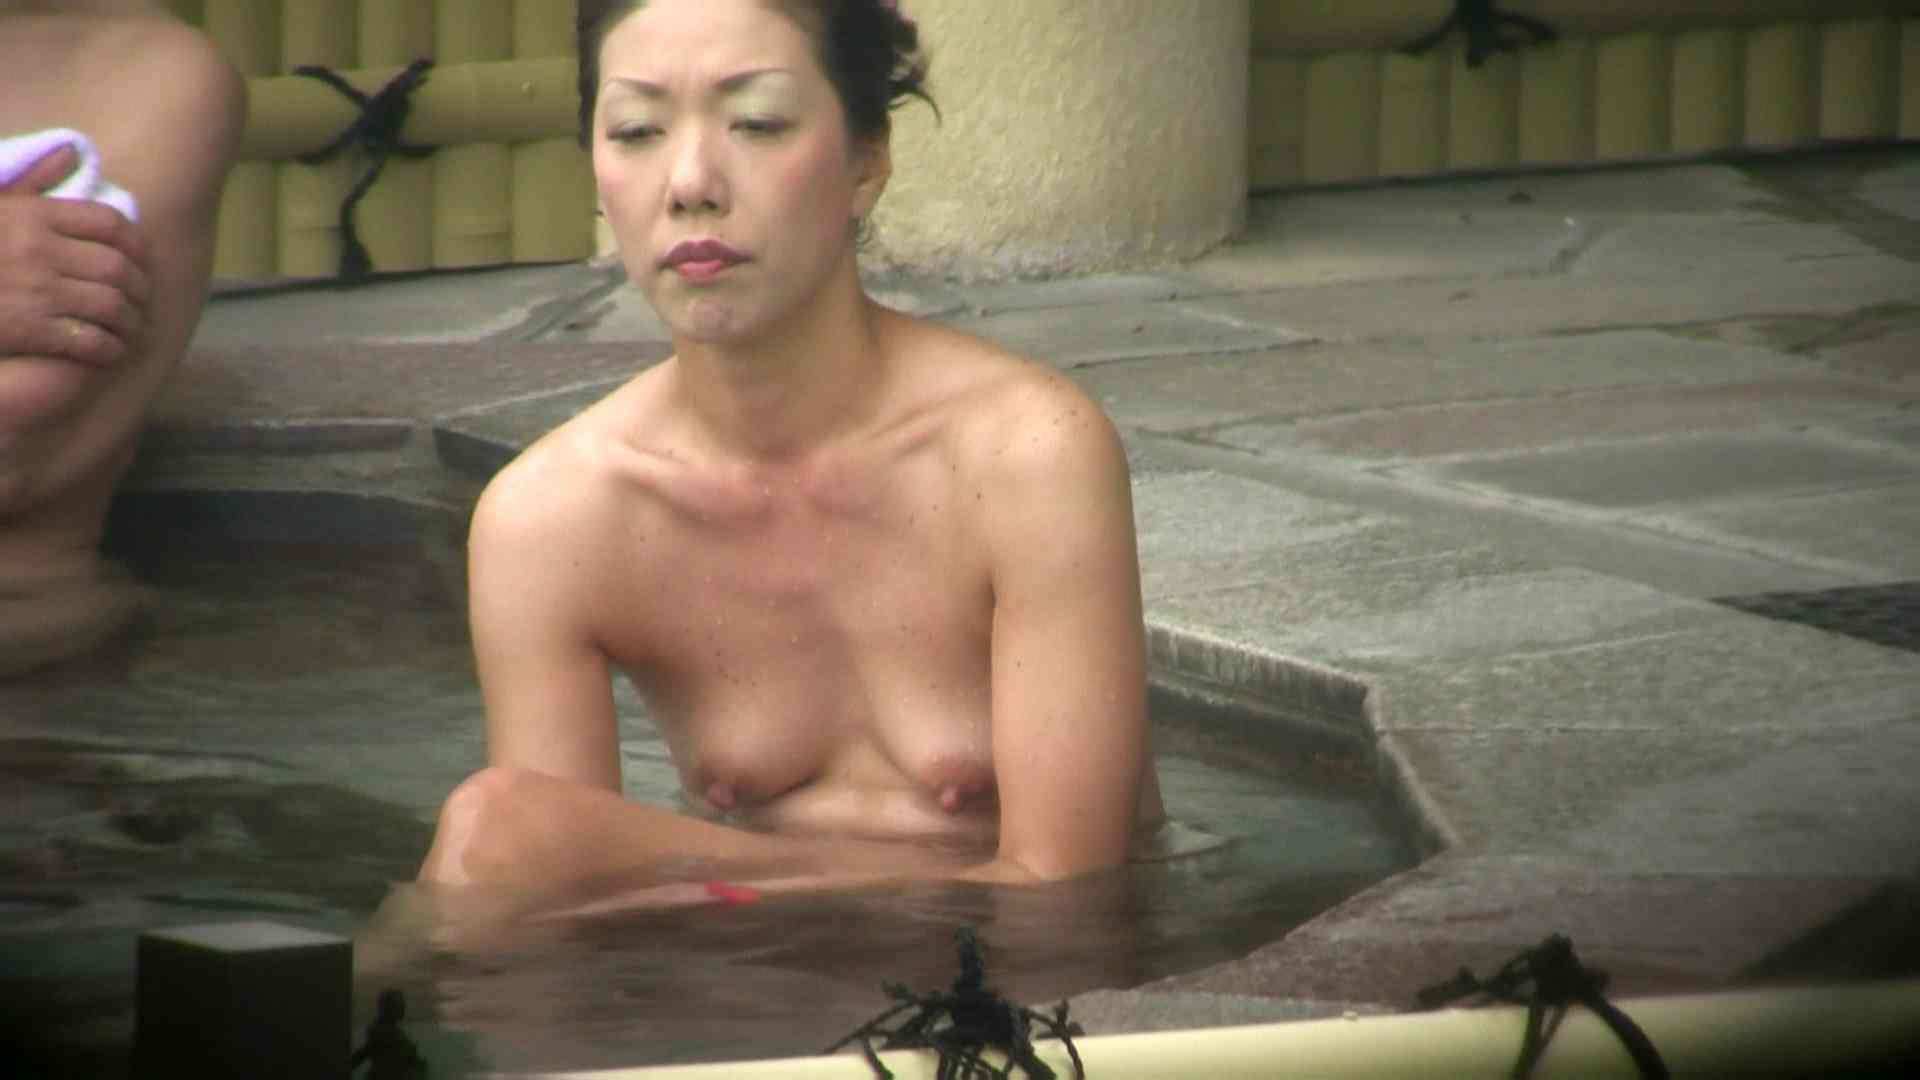 高画質露天女風呂観察 vol.036 OLセックス | 乙女  96画像 29